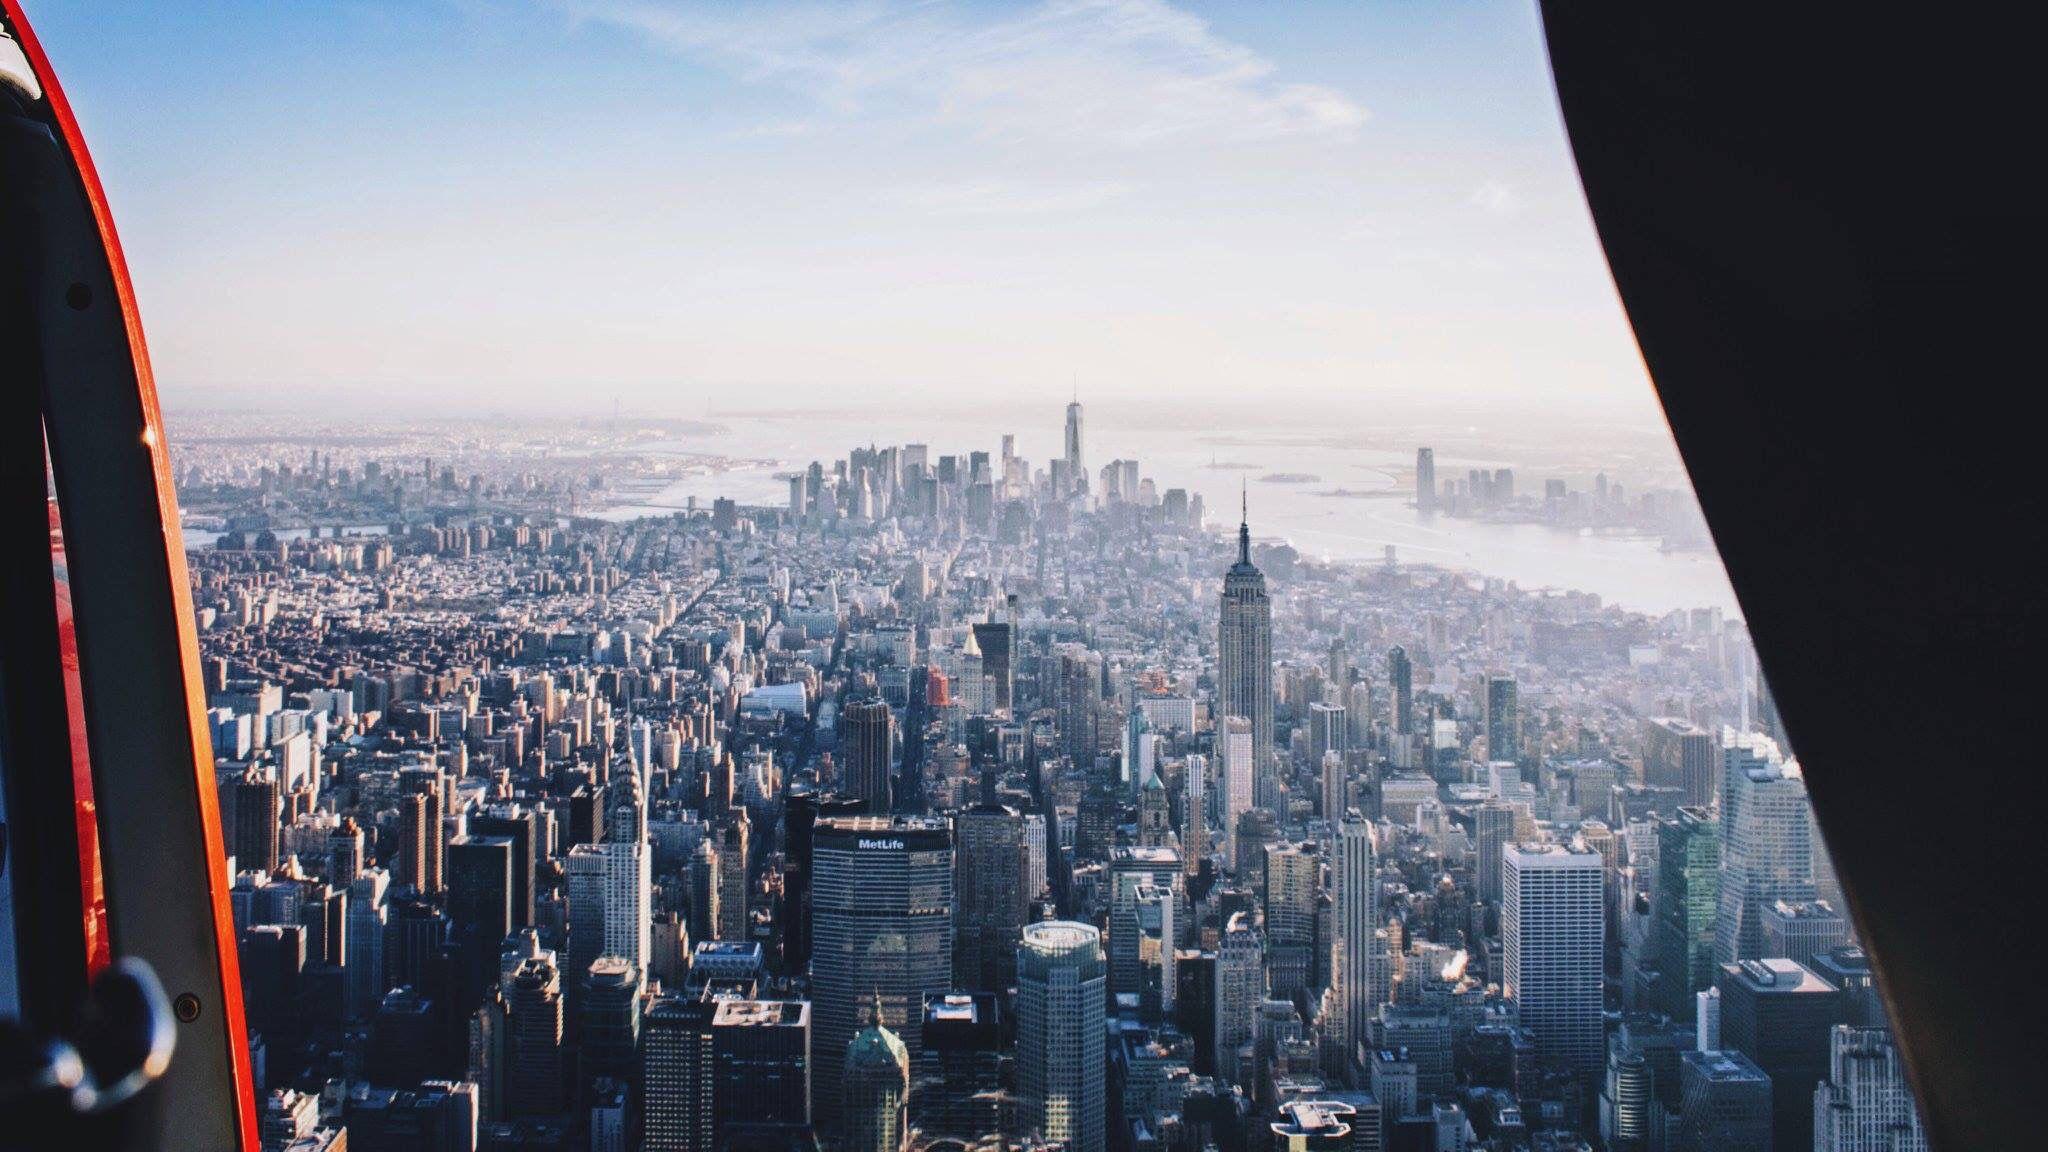 New York City Nyc United States Usa City America Dream City Ny City Concrete Jungle